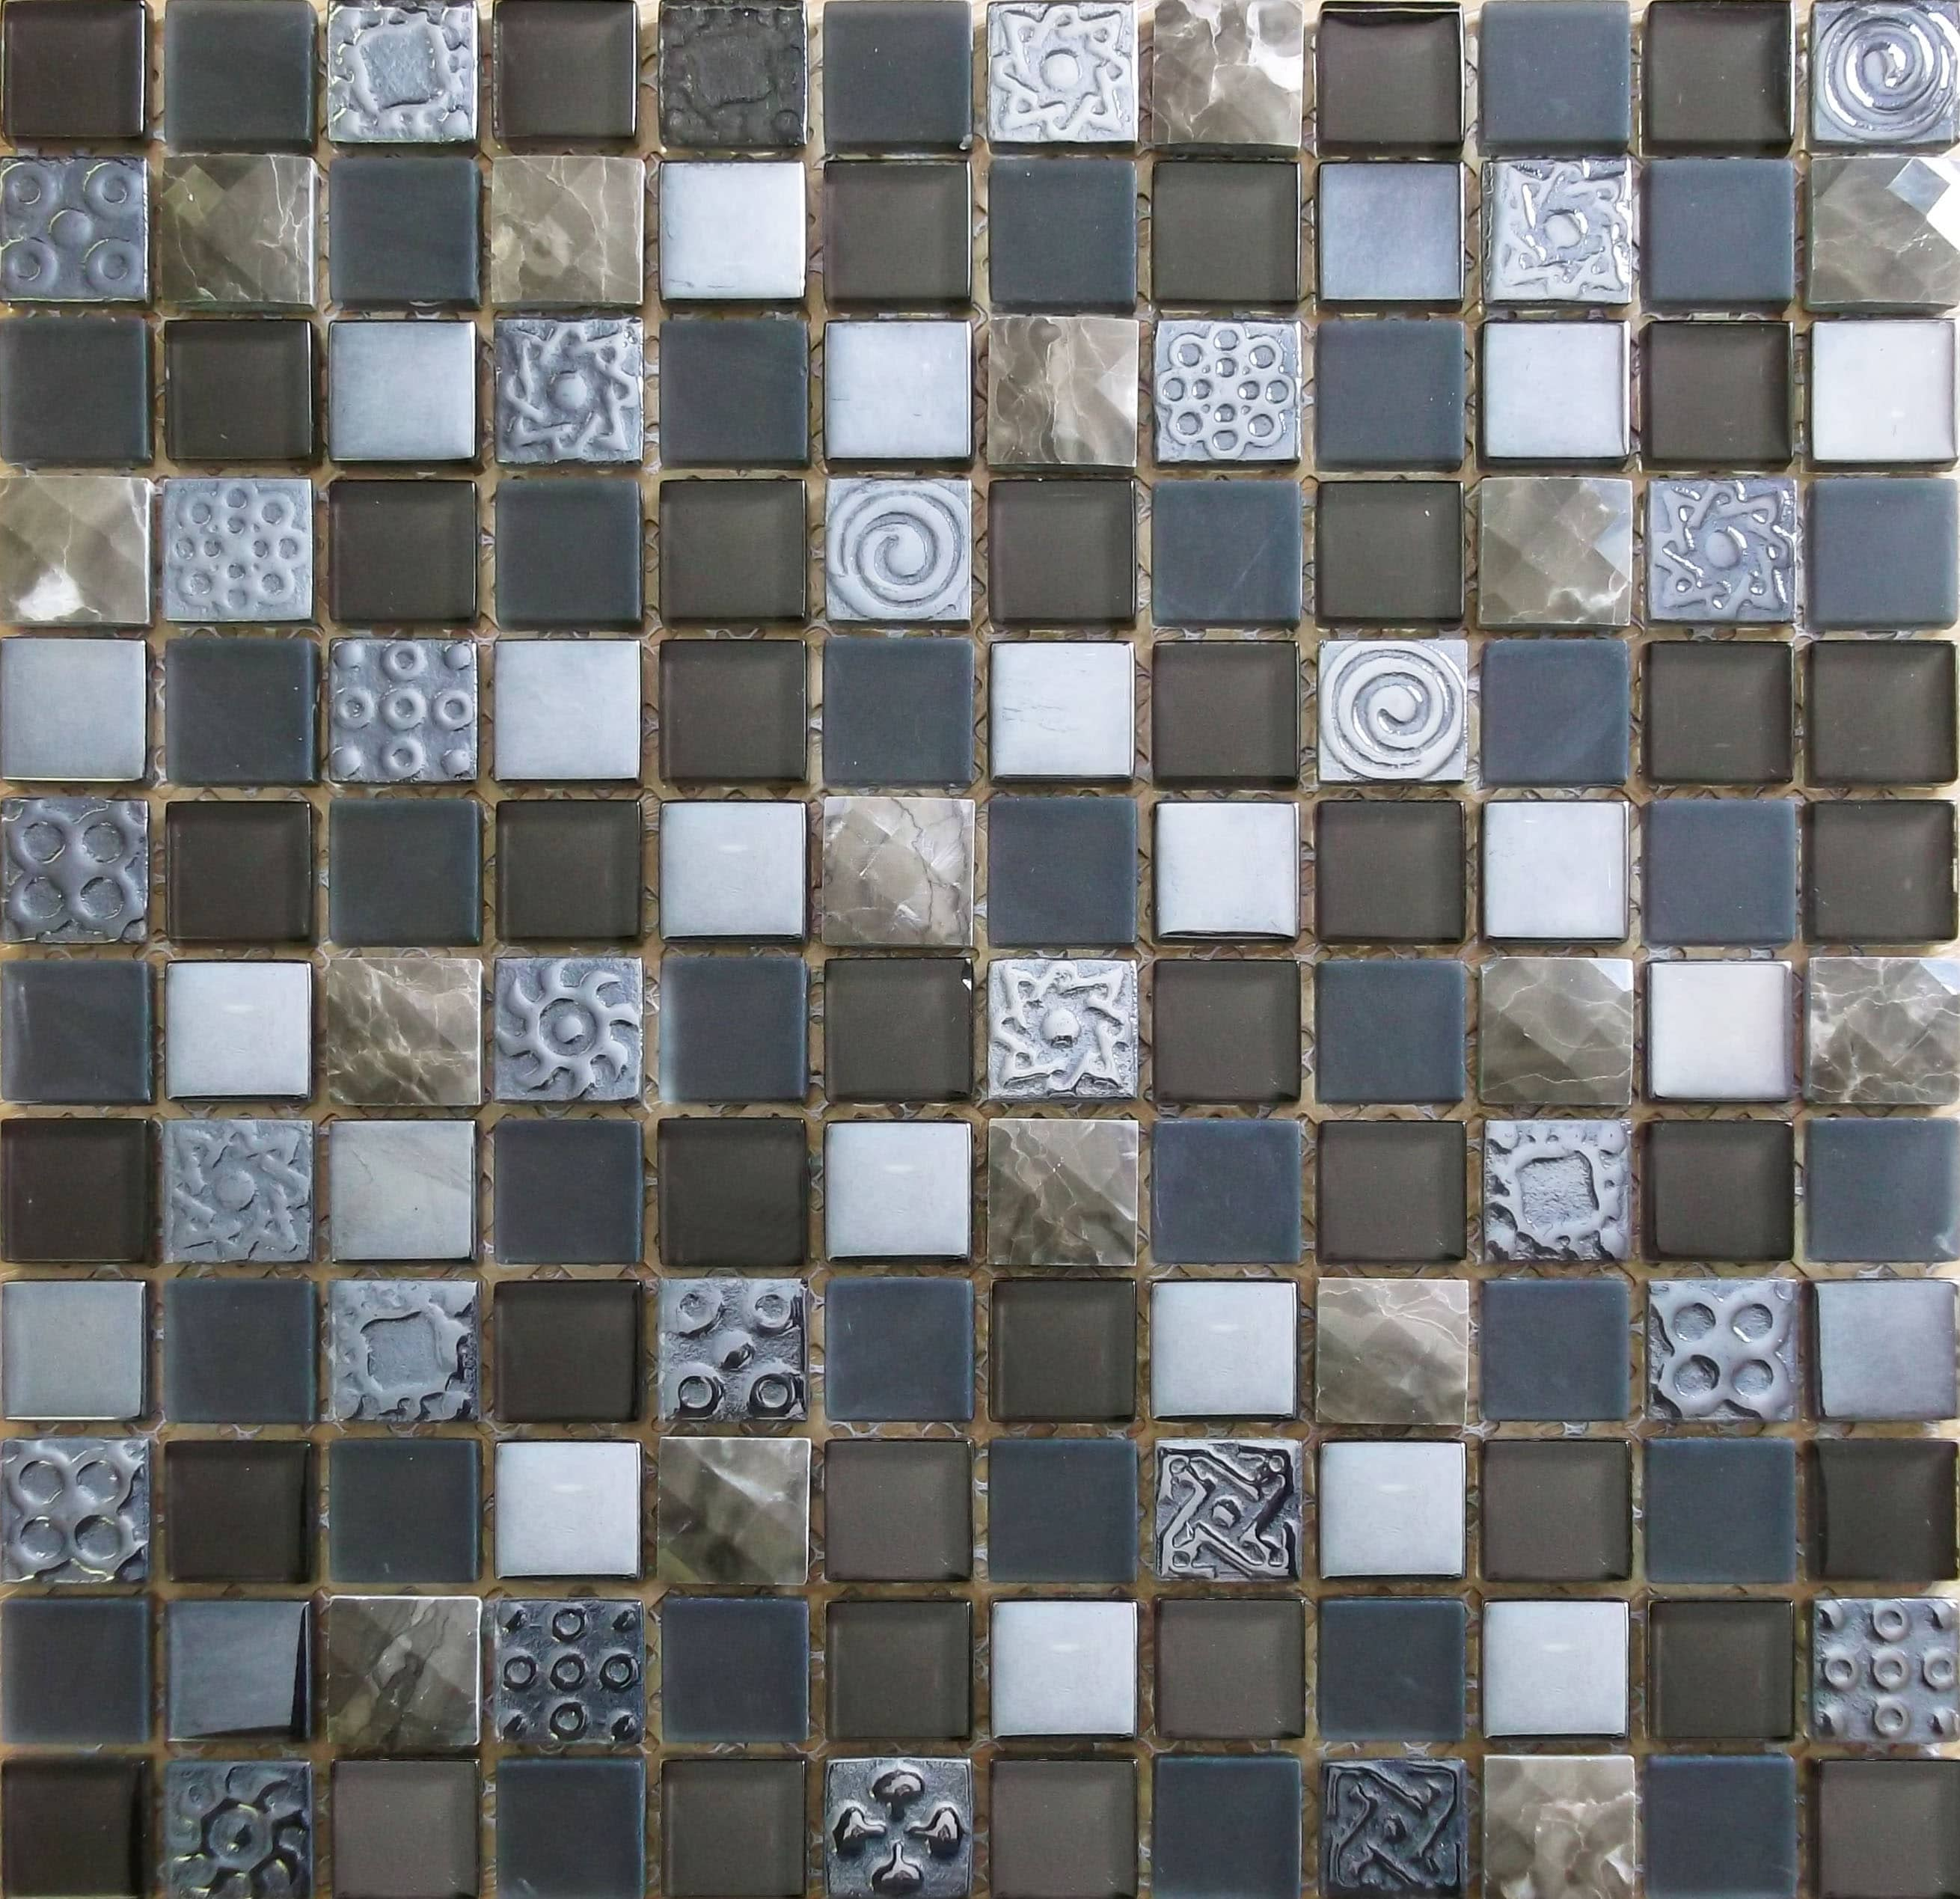 Natural Travertine Mosaic Tile L 300mm W 300mm: Mixed Colour Natural Stone & Glass Mosaic Tile